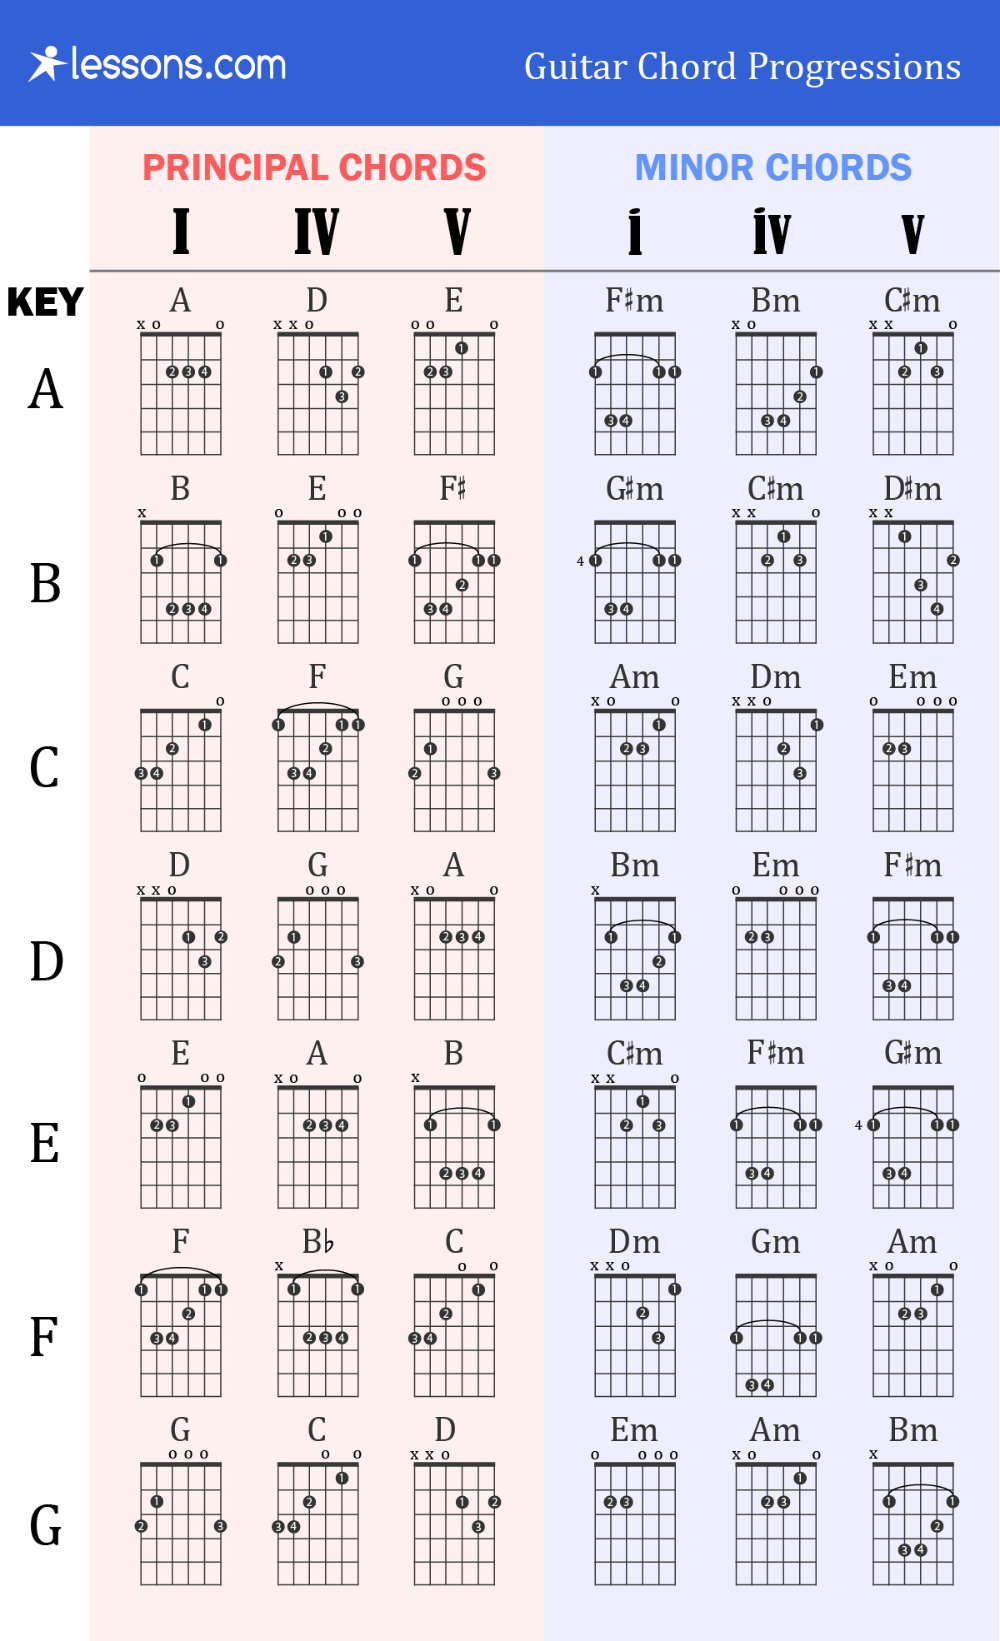 Guitar Chord Progressions Guitar Chord Chart Guitar Chord Progressions Guitar Chords